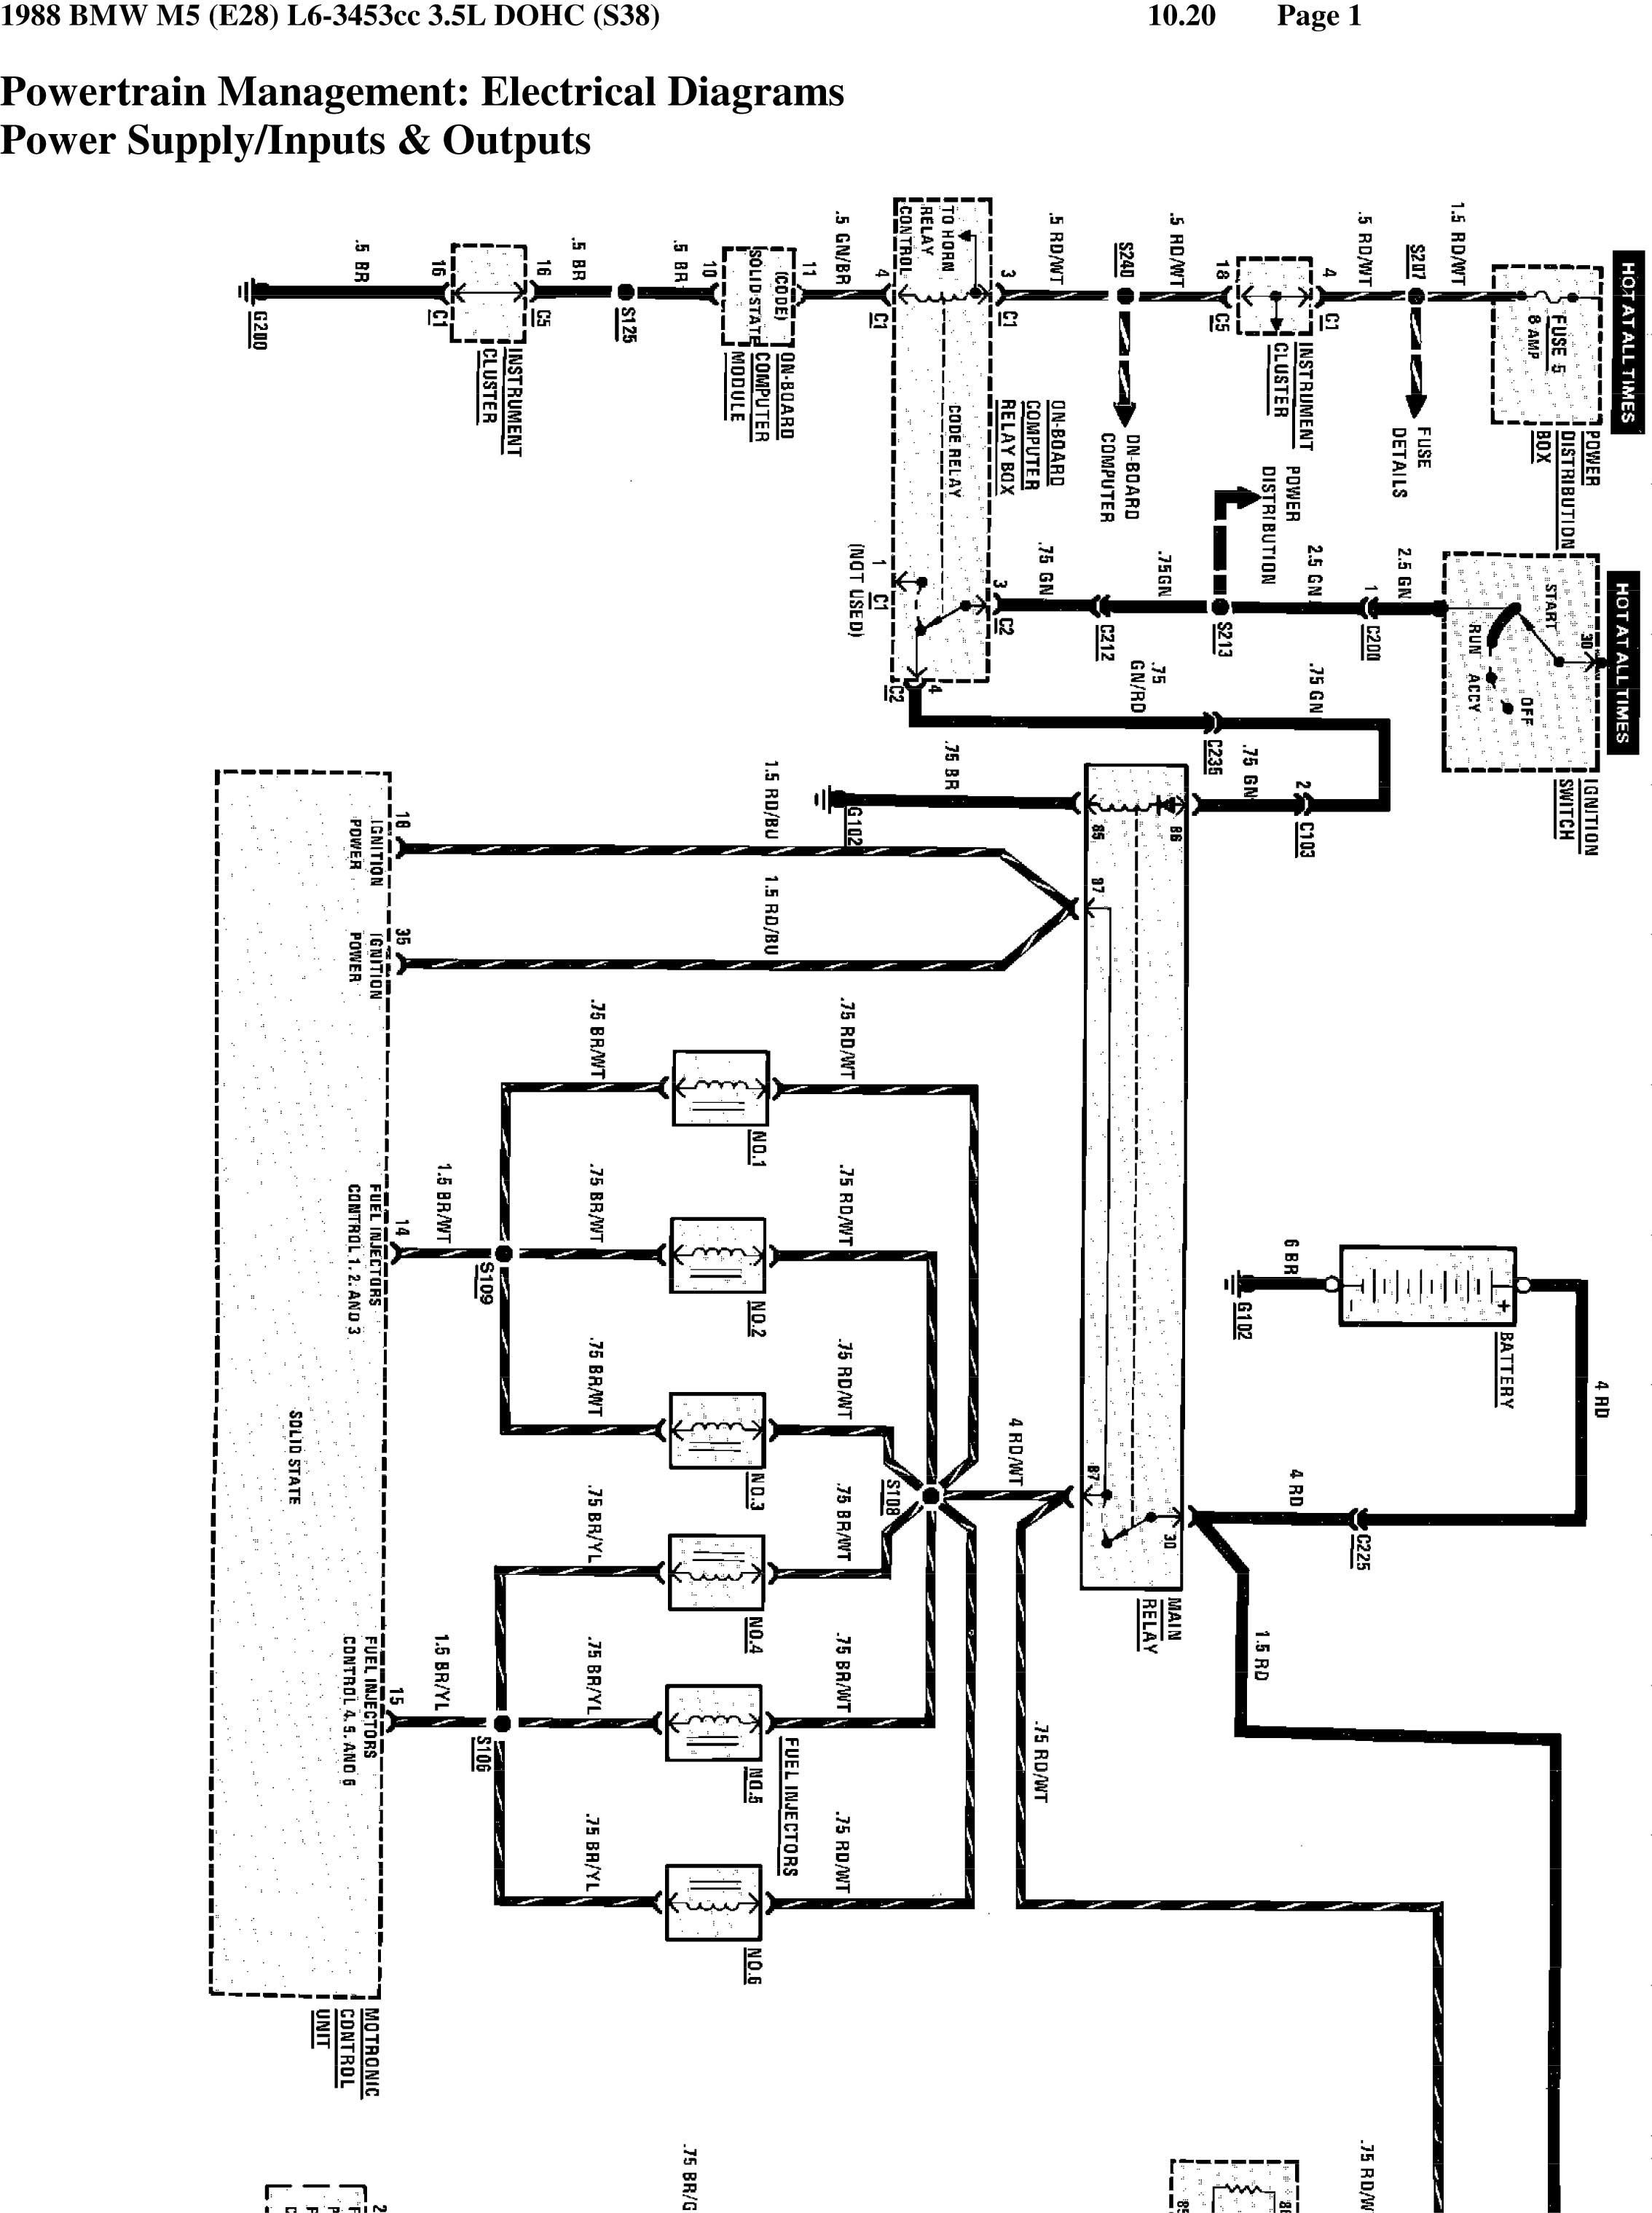 bmw e28 wiring diagram